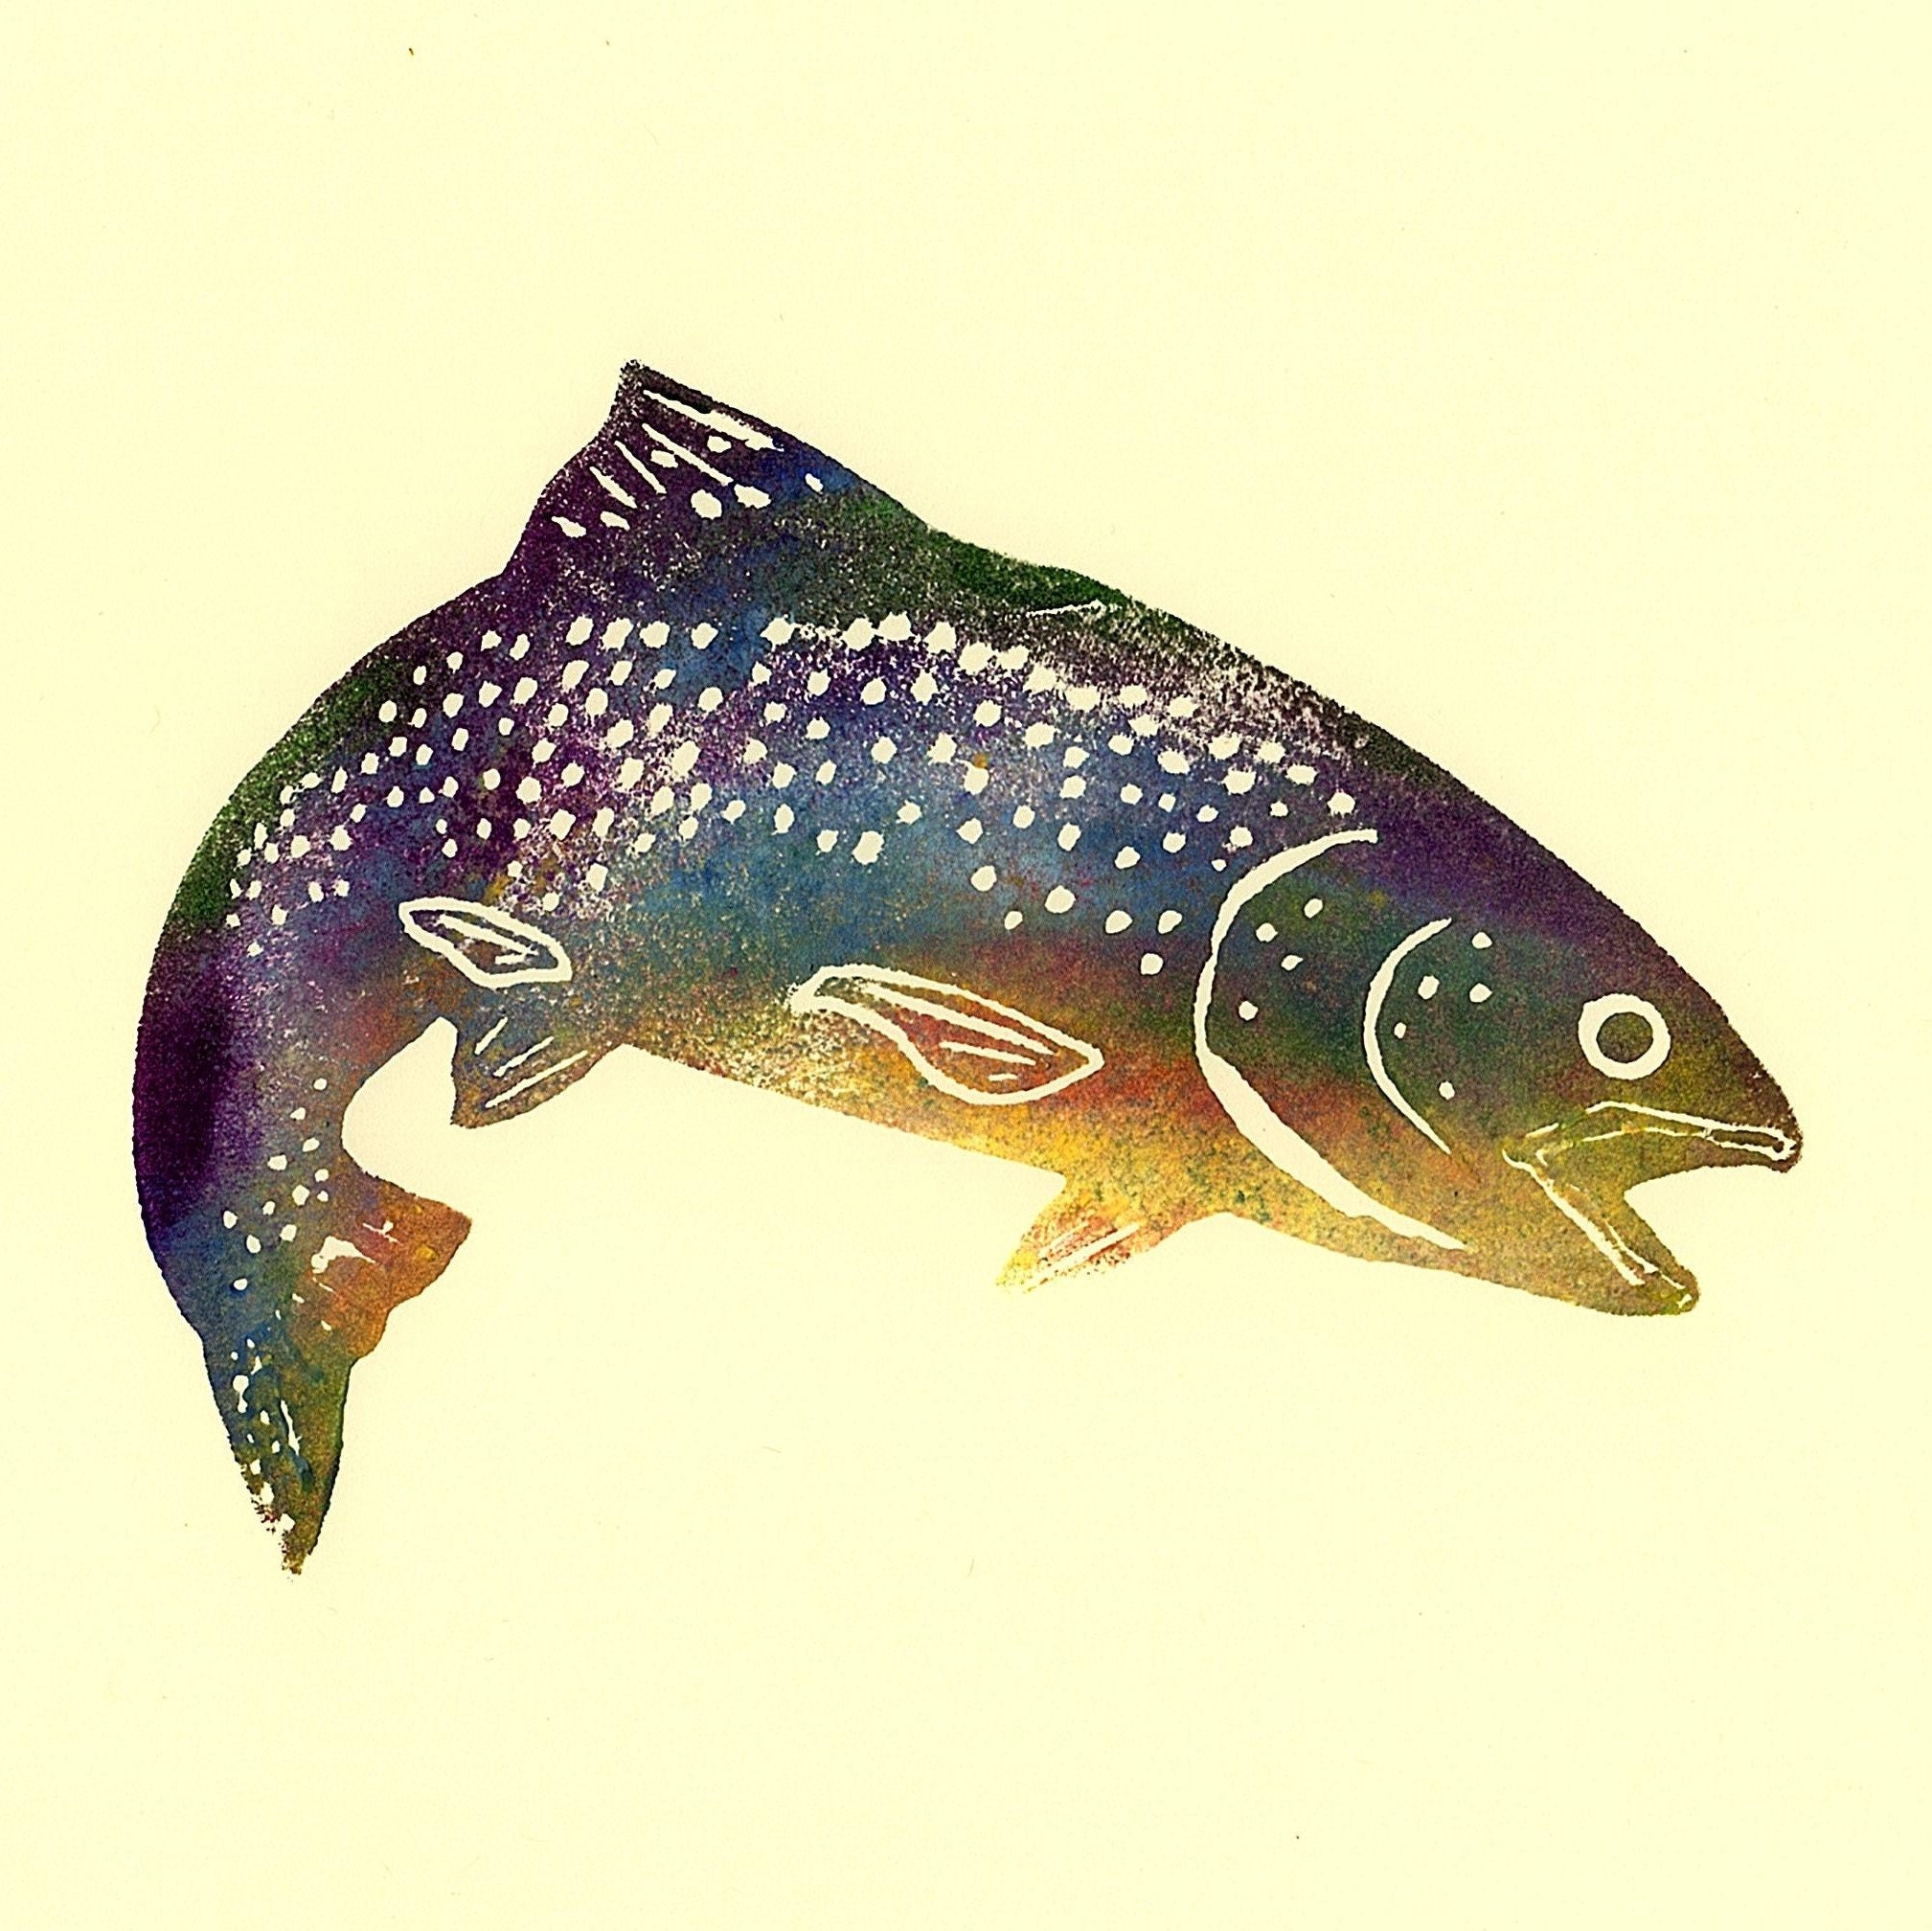 Fly Fishing Reel Bag fishing gifts for men Christmas gift   Etsy